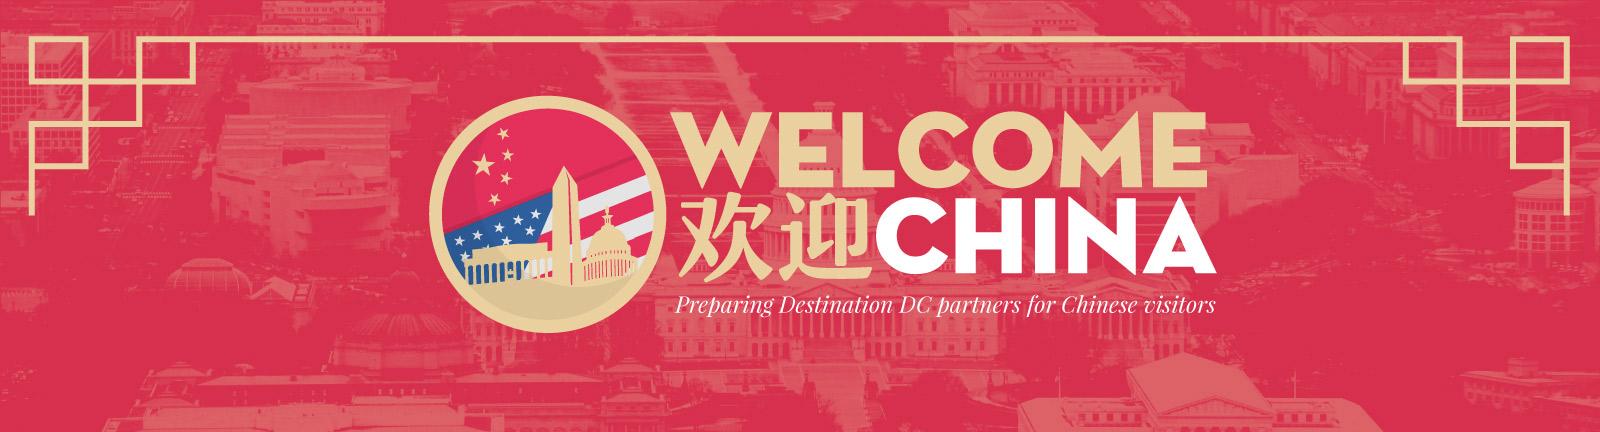 Welcome (Huanying) China Program - Washington, DC